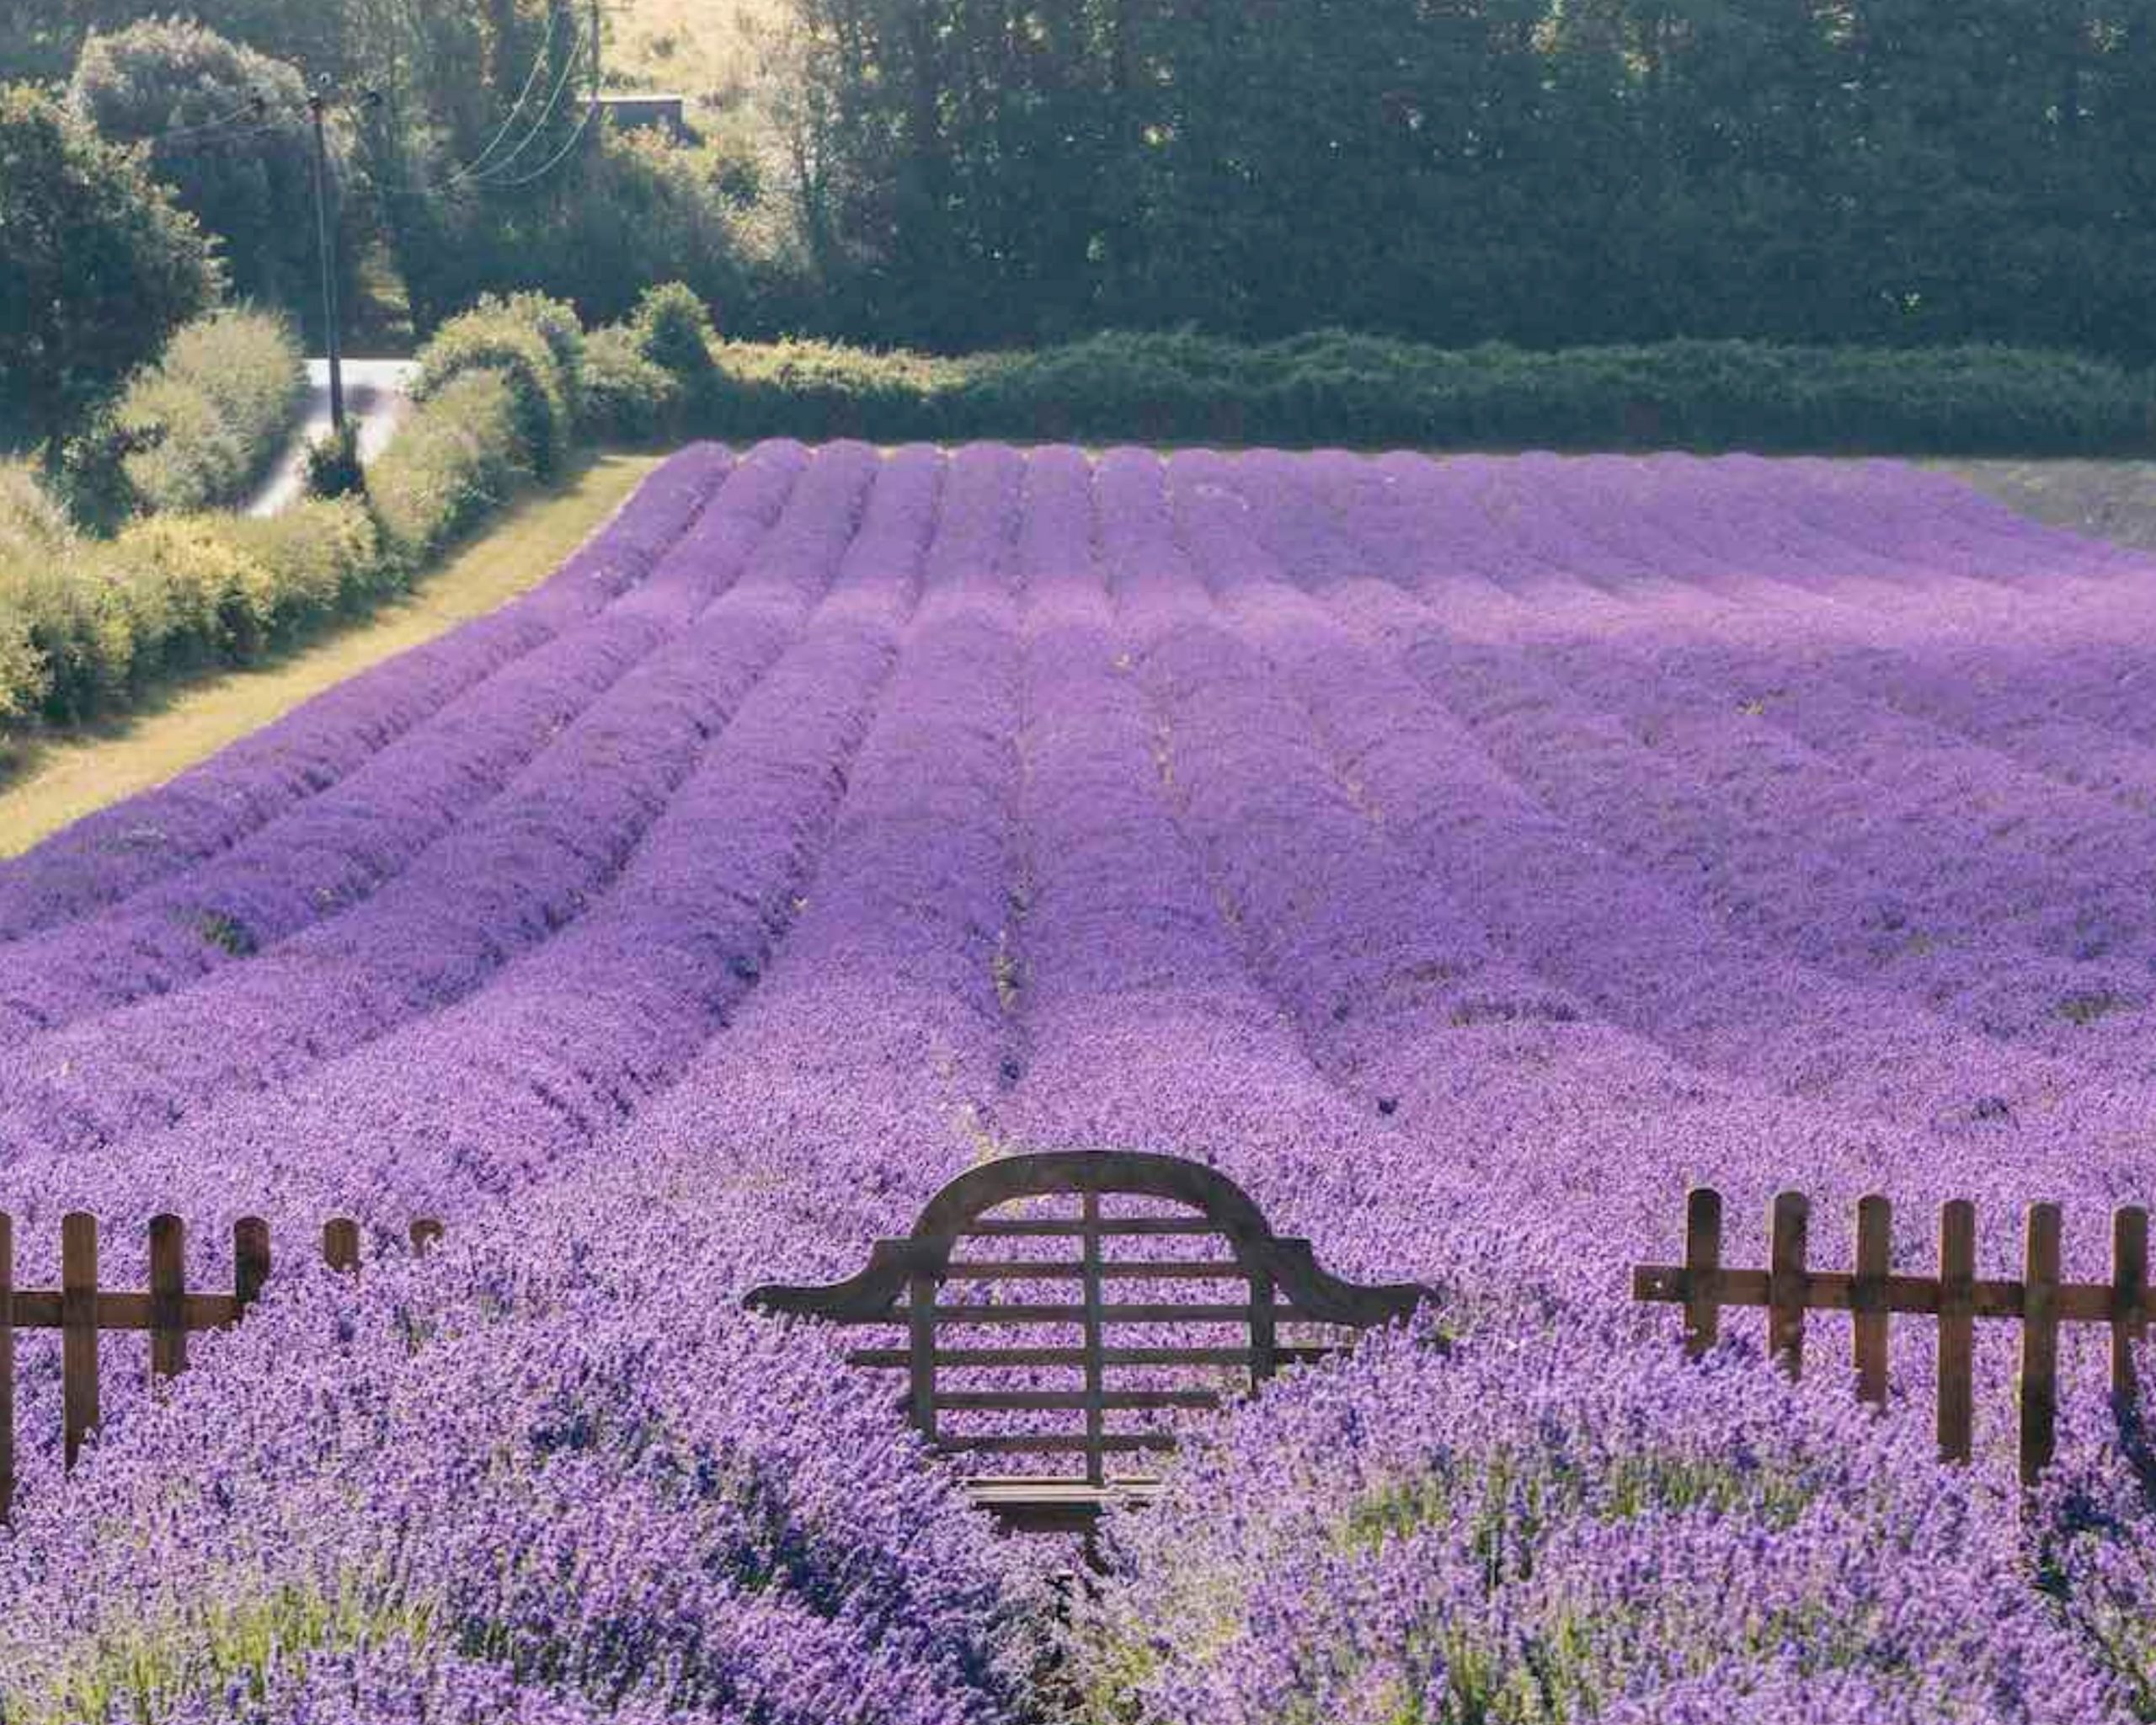 Field of lavender in Kent